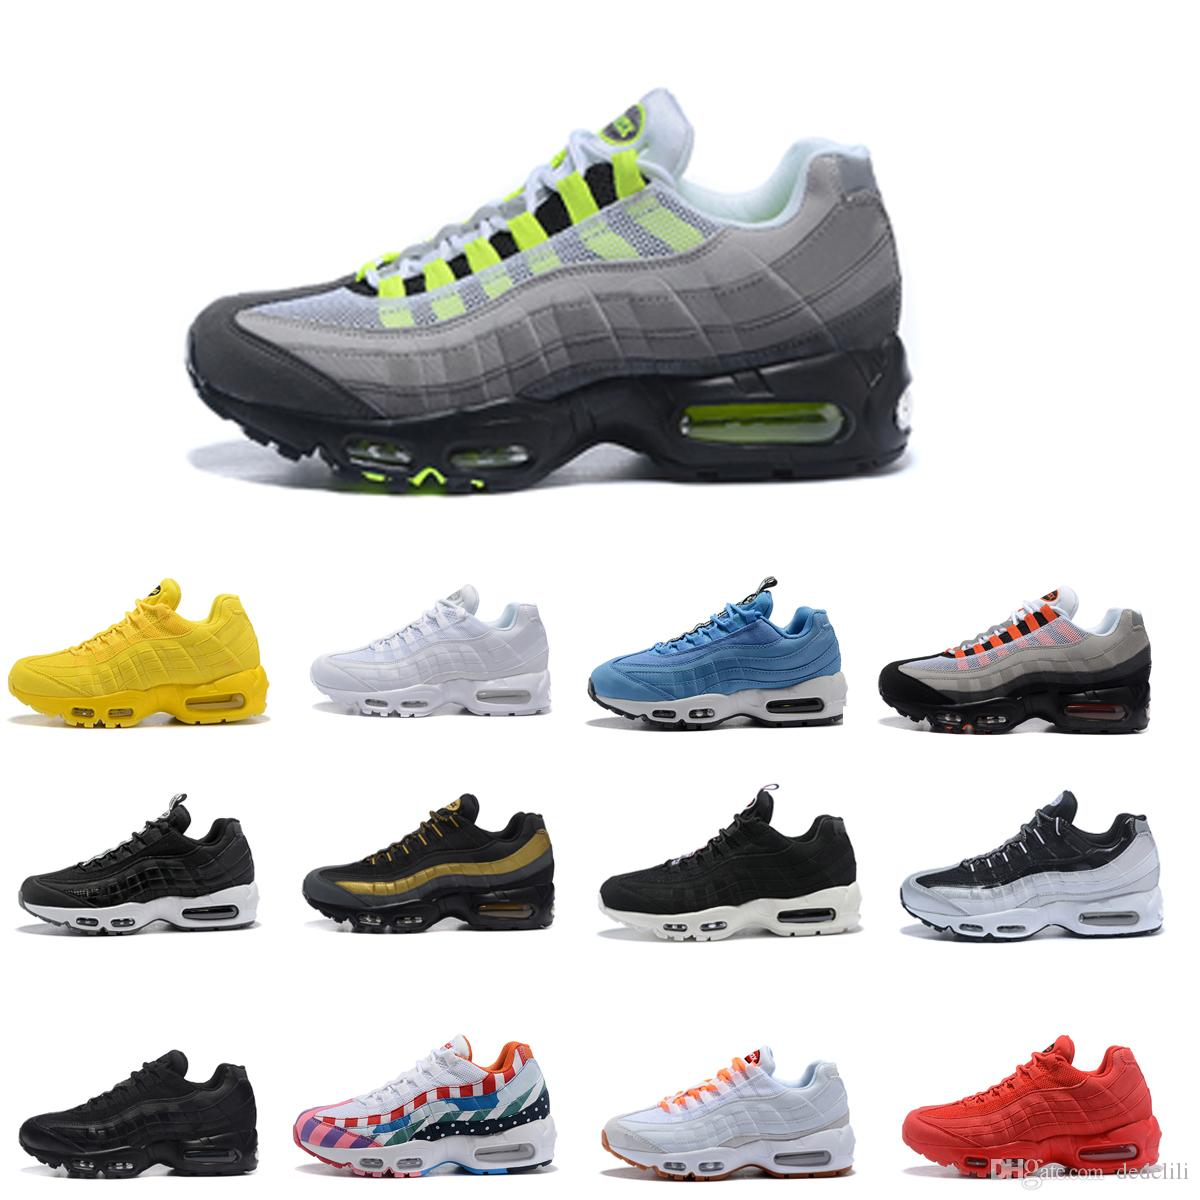 finest selection bf46c d4327 Großhandel Nike Air Max 95 Airmax 95 Herren Retro 95 OG Kissen Navy Sport  Hochwertige Chaussure 95s Wanderschuhe Herren Laufschuhe Kissen 95 Sneakers  Größe ...